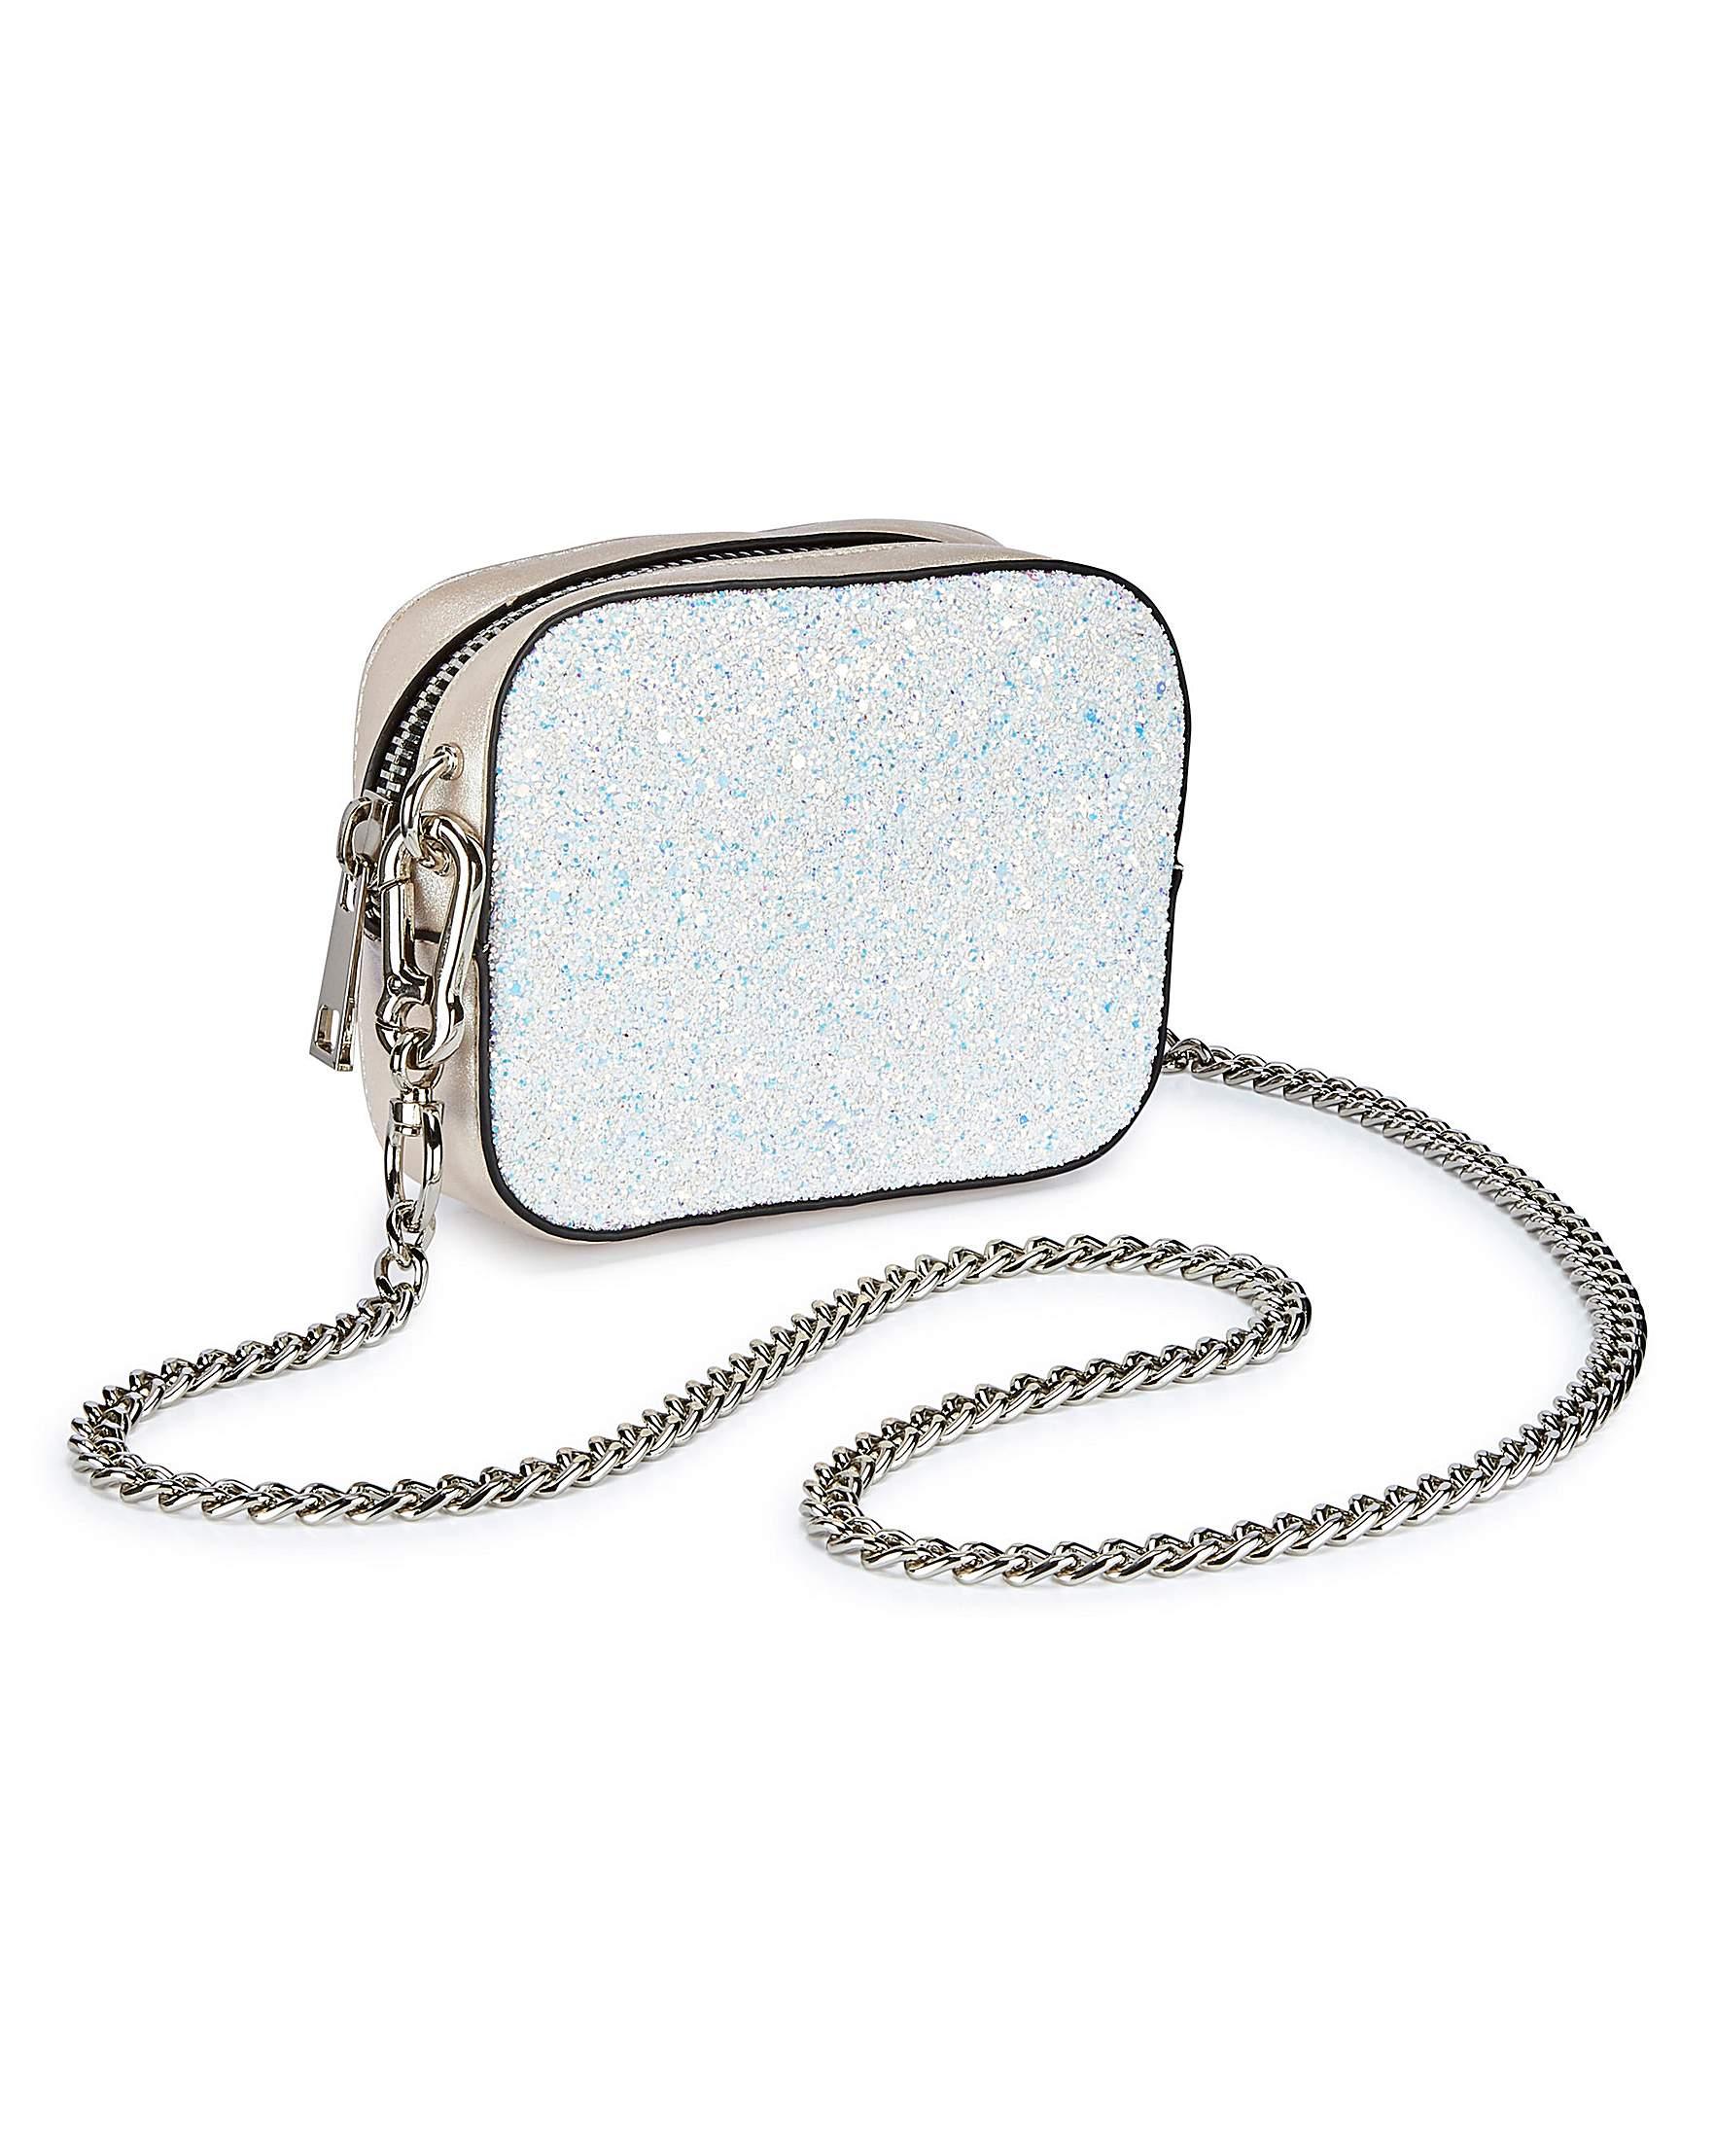 JD Williams Trixie Mini Glitter Shoulder Bag bbNvXJlJxT